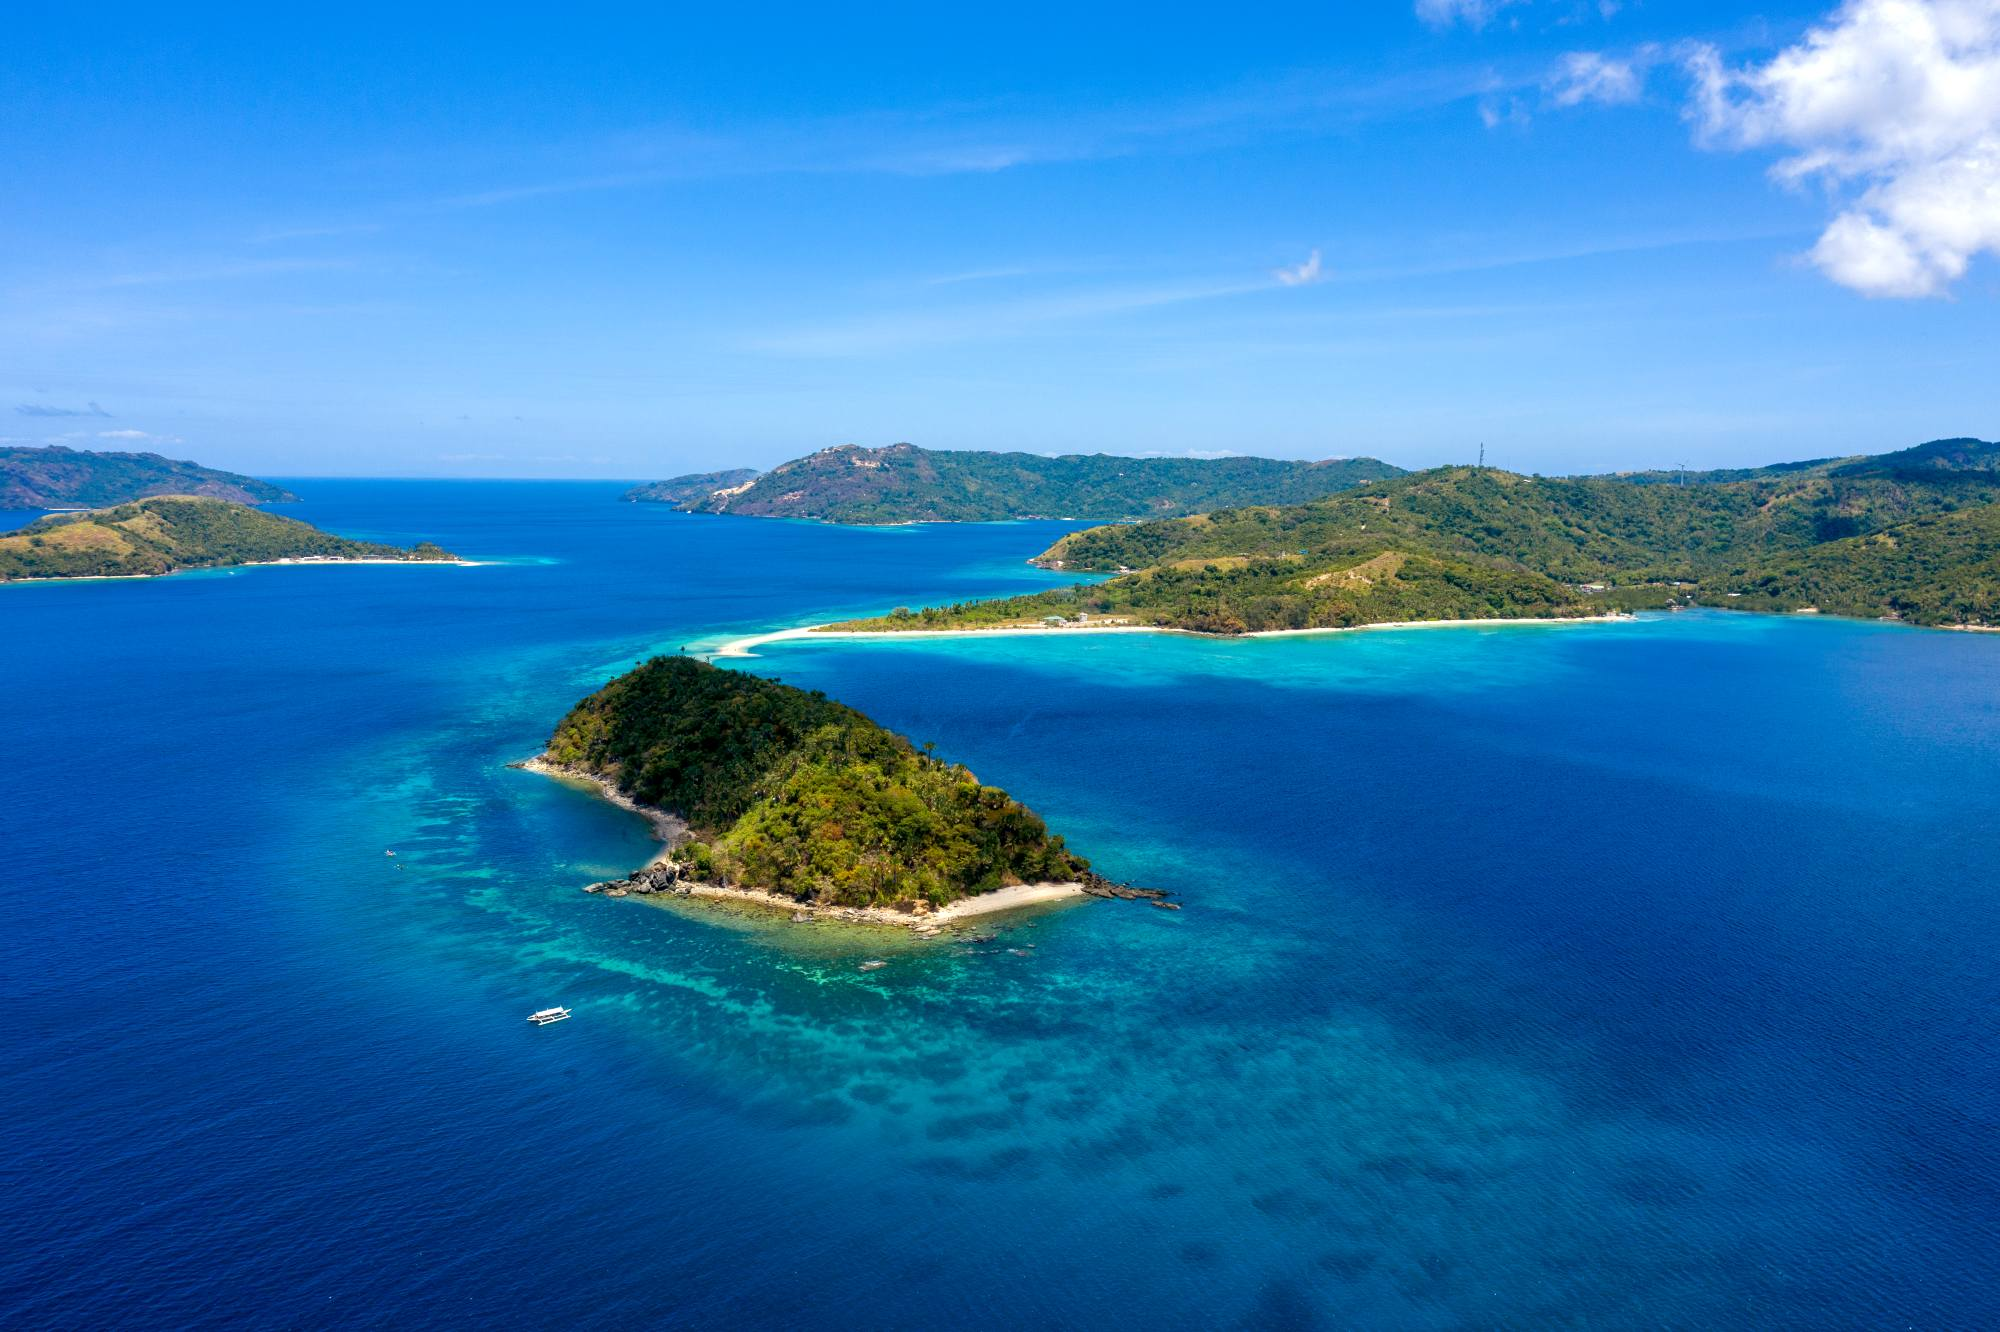 www.the-three-p.com-romblon-island-underwater-macro-photography-scuba-diving-dive-site-bangug-island.jpg